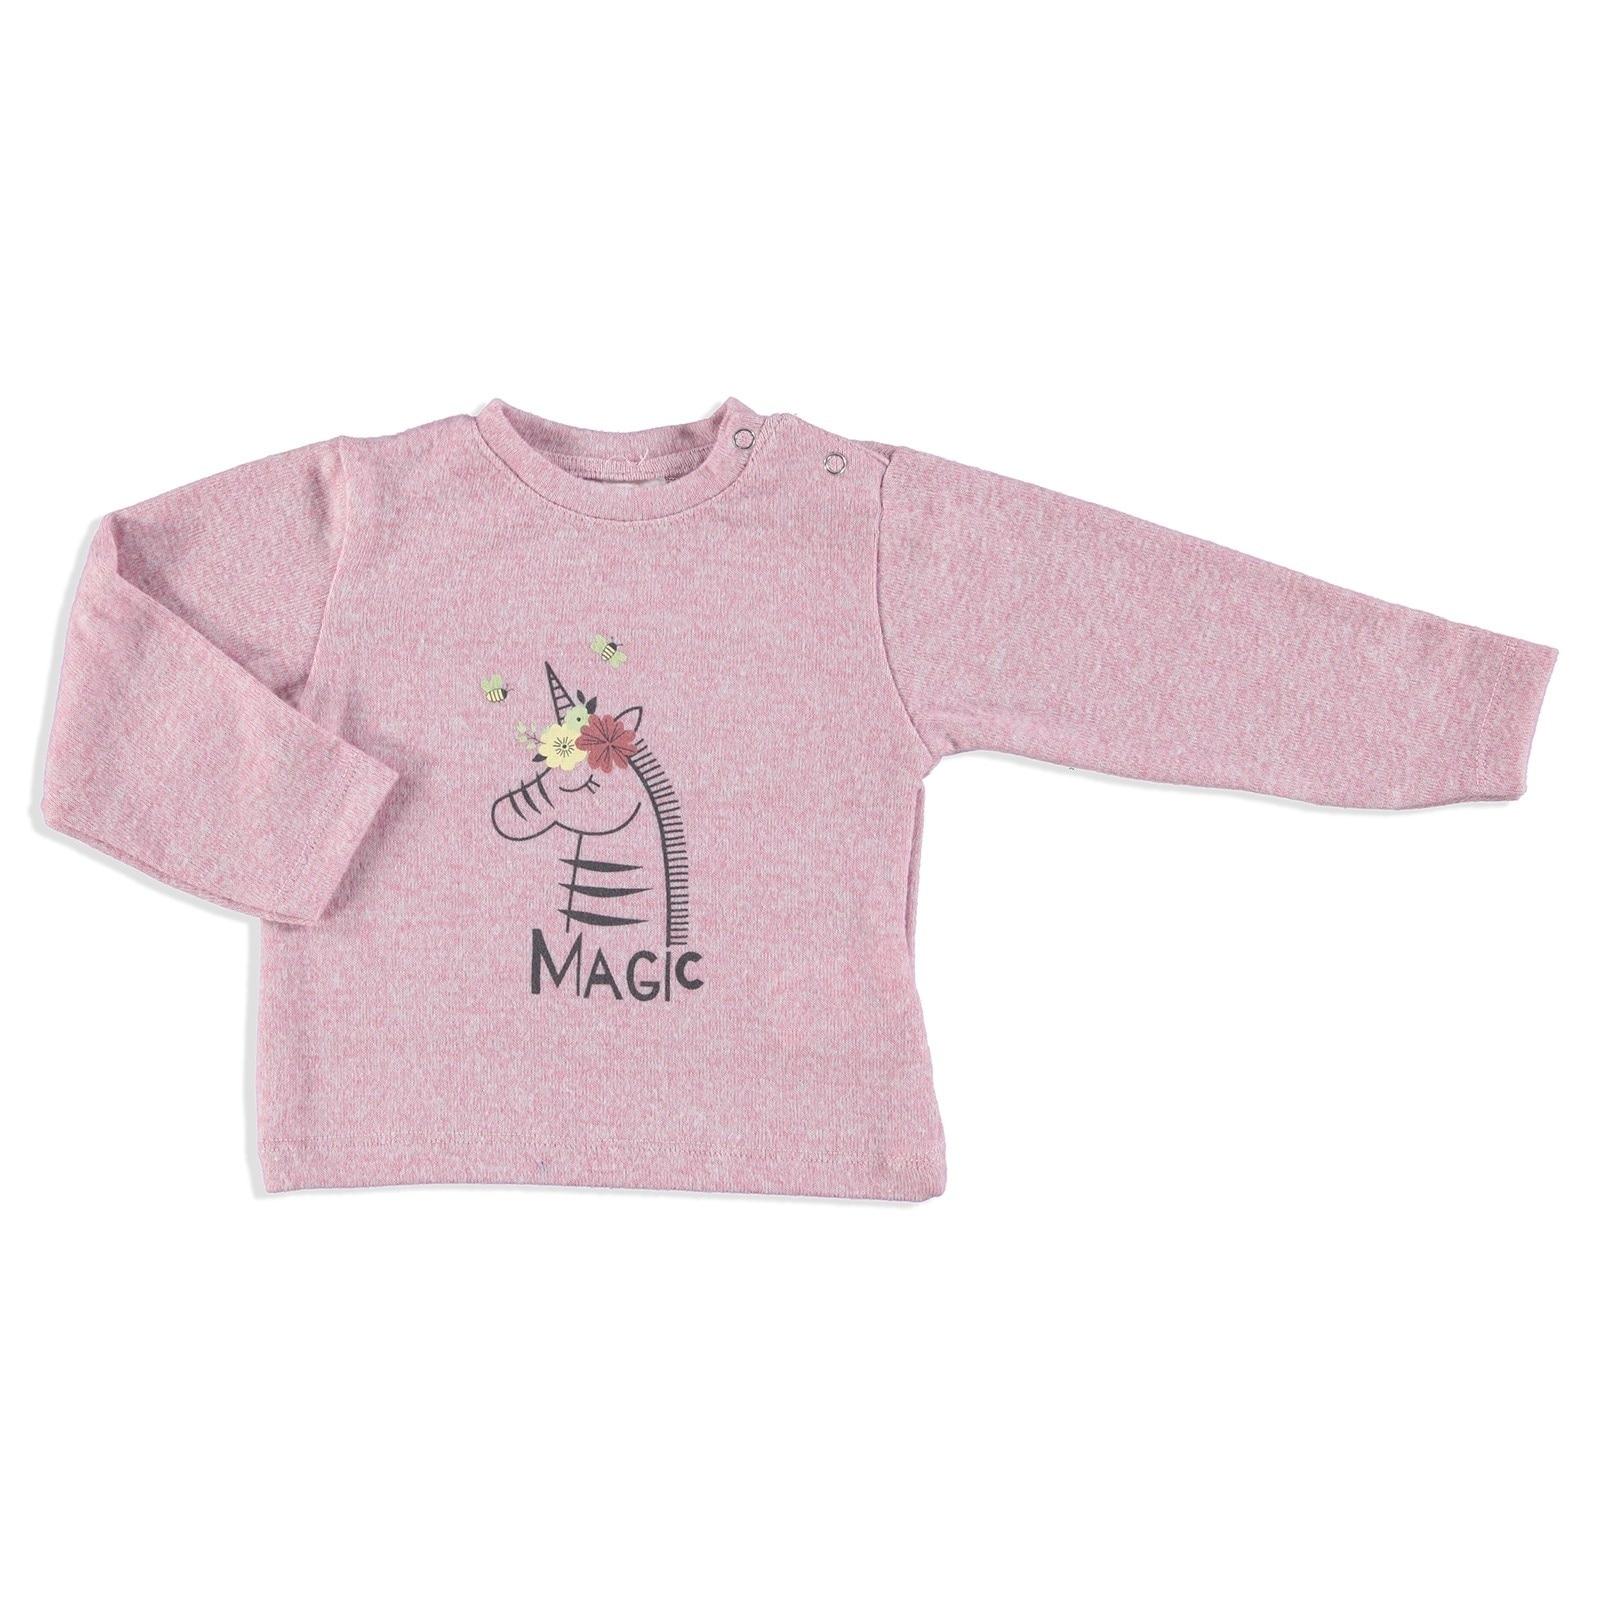 Ebebek Bombili Winter Printed Baby Girl Soft Touch Sweatshirt